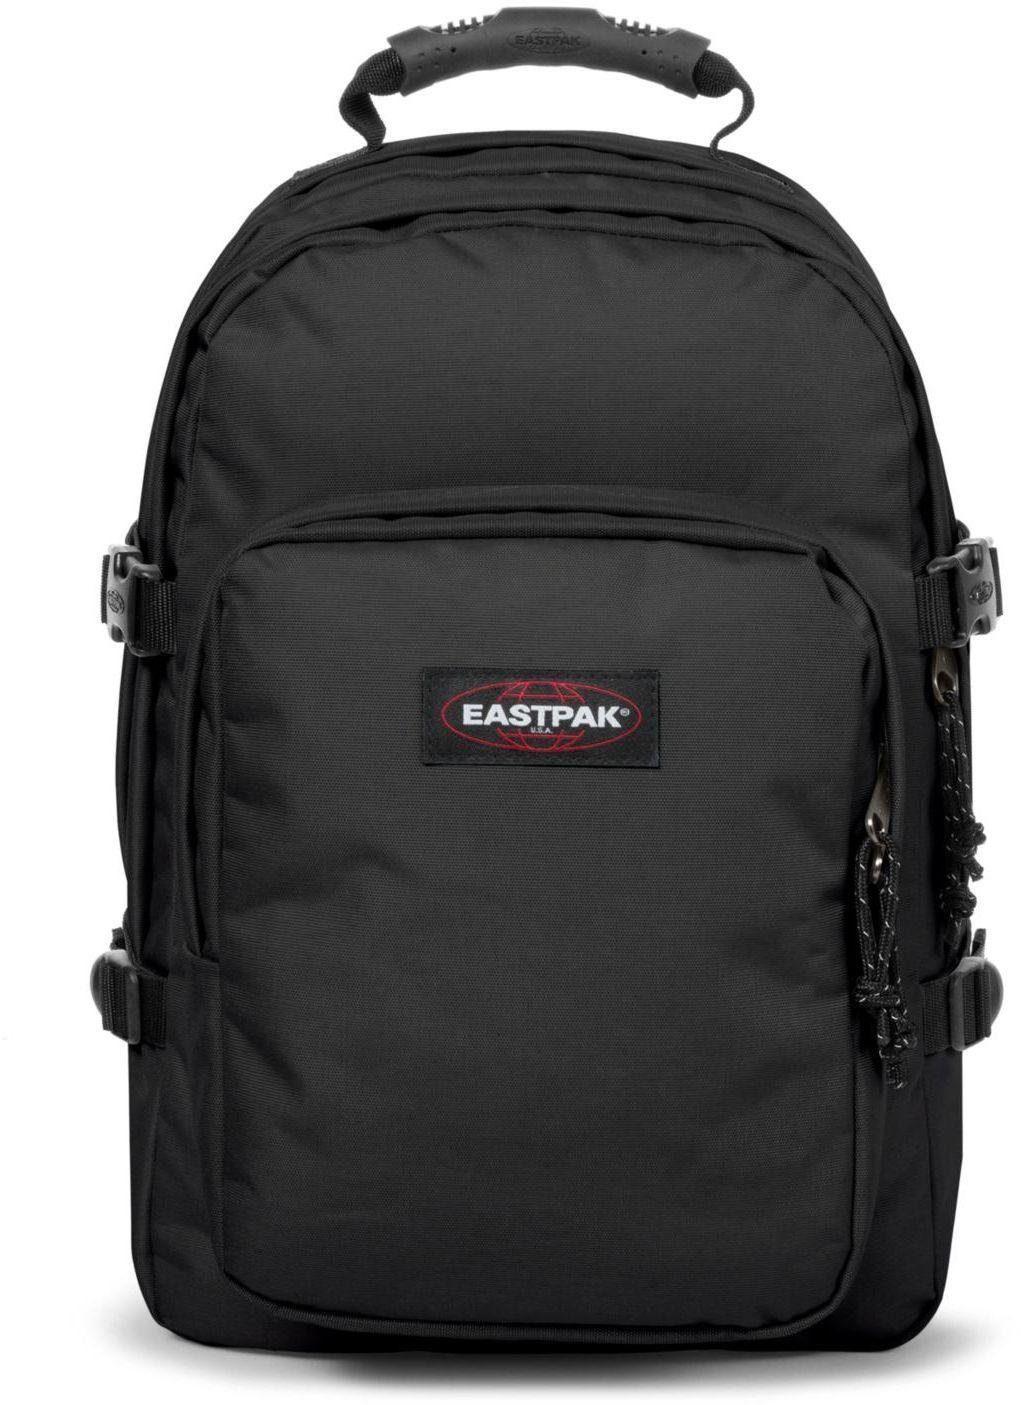 Eastpak Rucksack mit Laptopfach, »PROVIDER black«